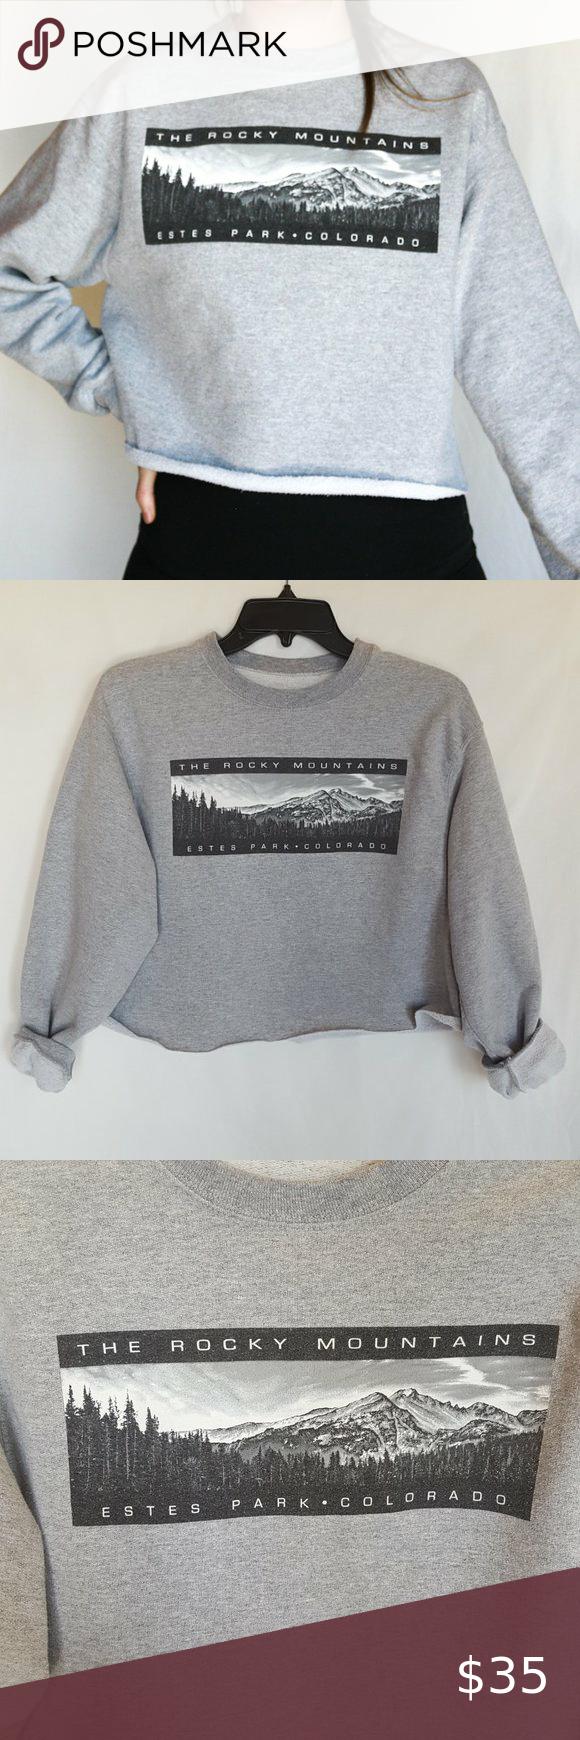 Rocky Mountain Cropped Sweatshirt Crop Sweatshirt Sweatshirts Cropped Crewneck [ 1740 x 580 Pixel ]